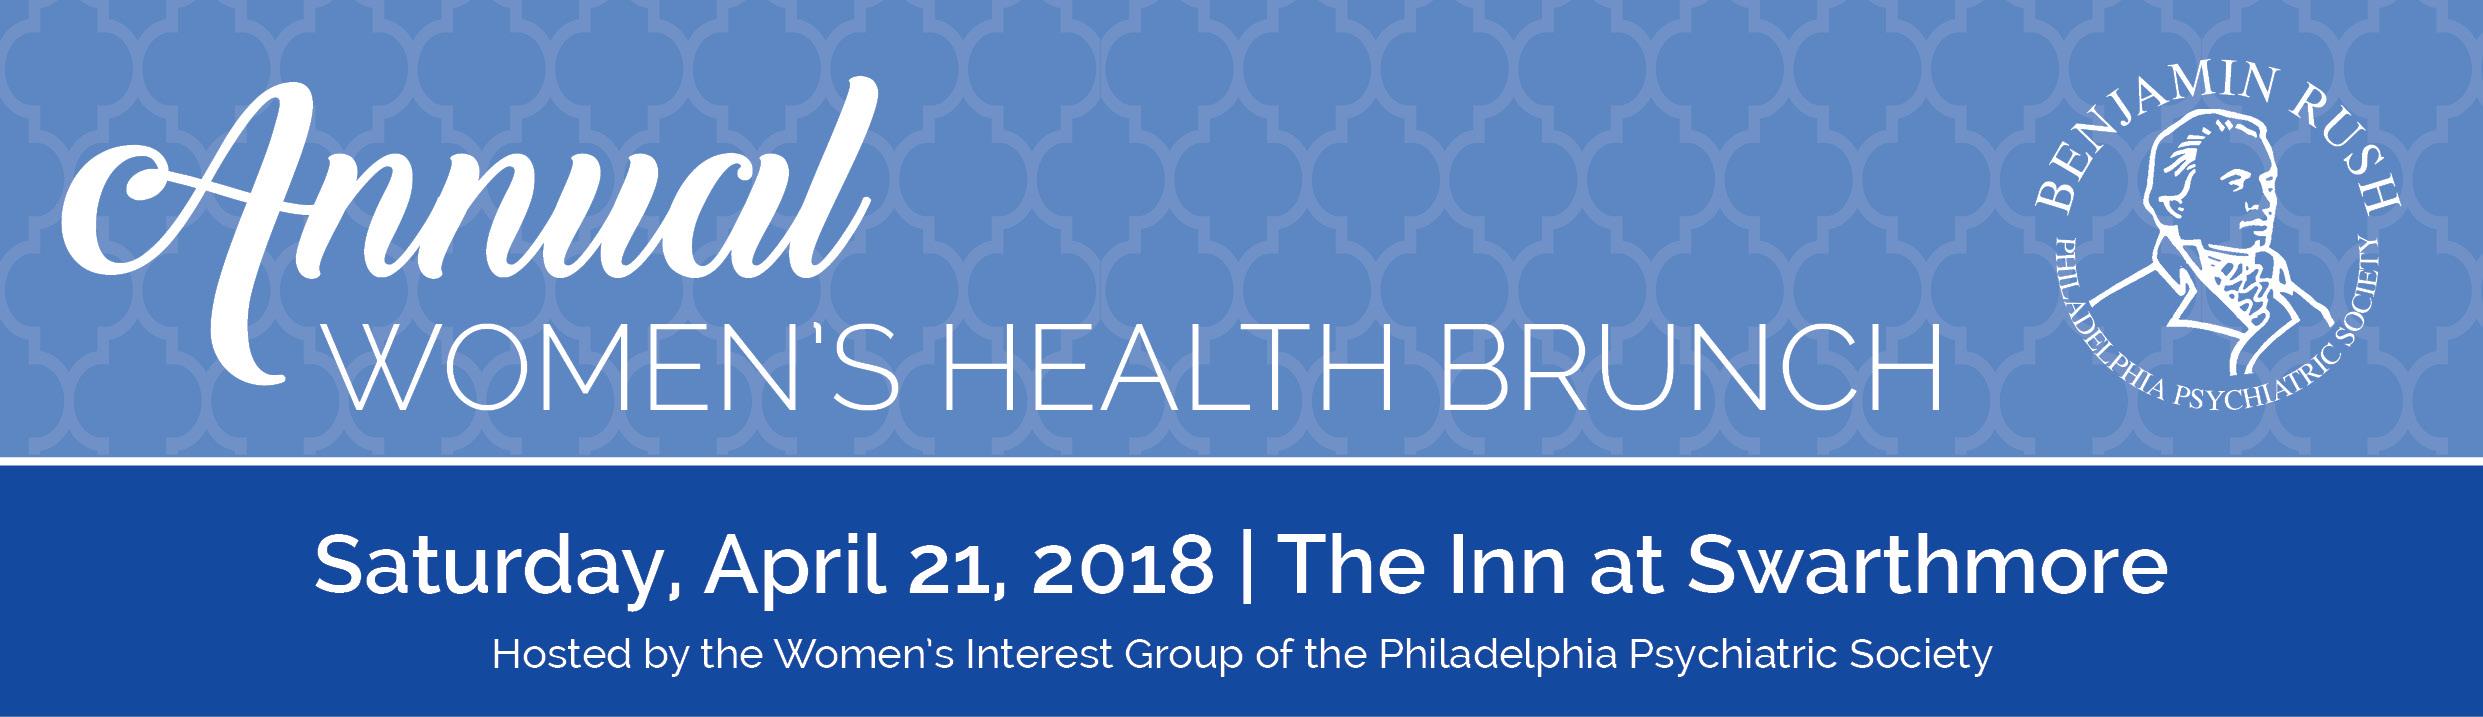 Annual Women's Health Brunch 2018